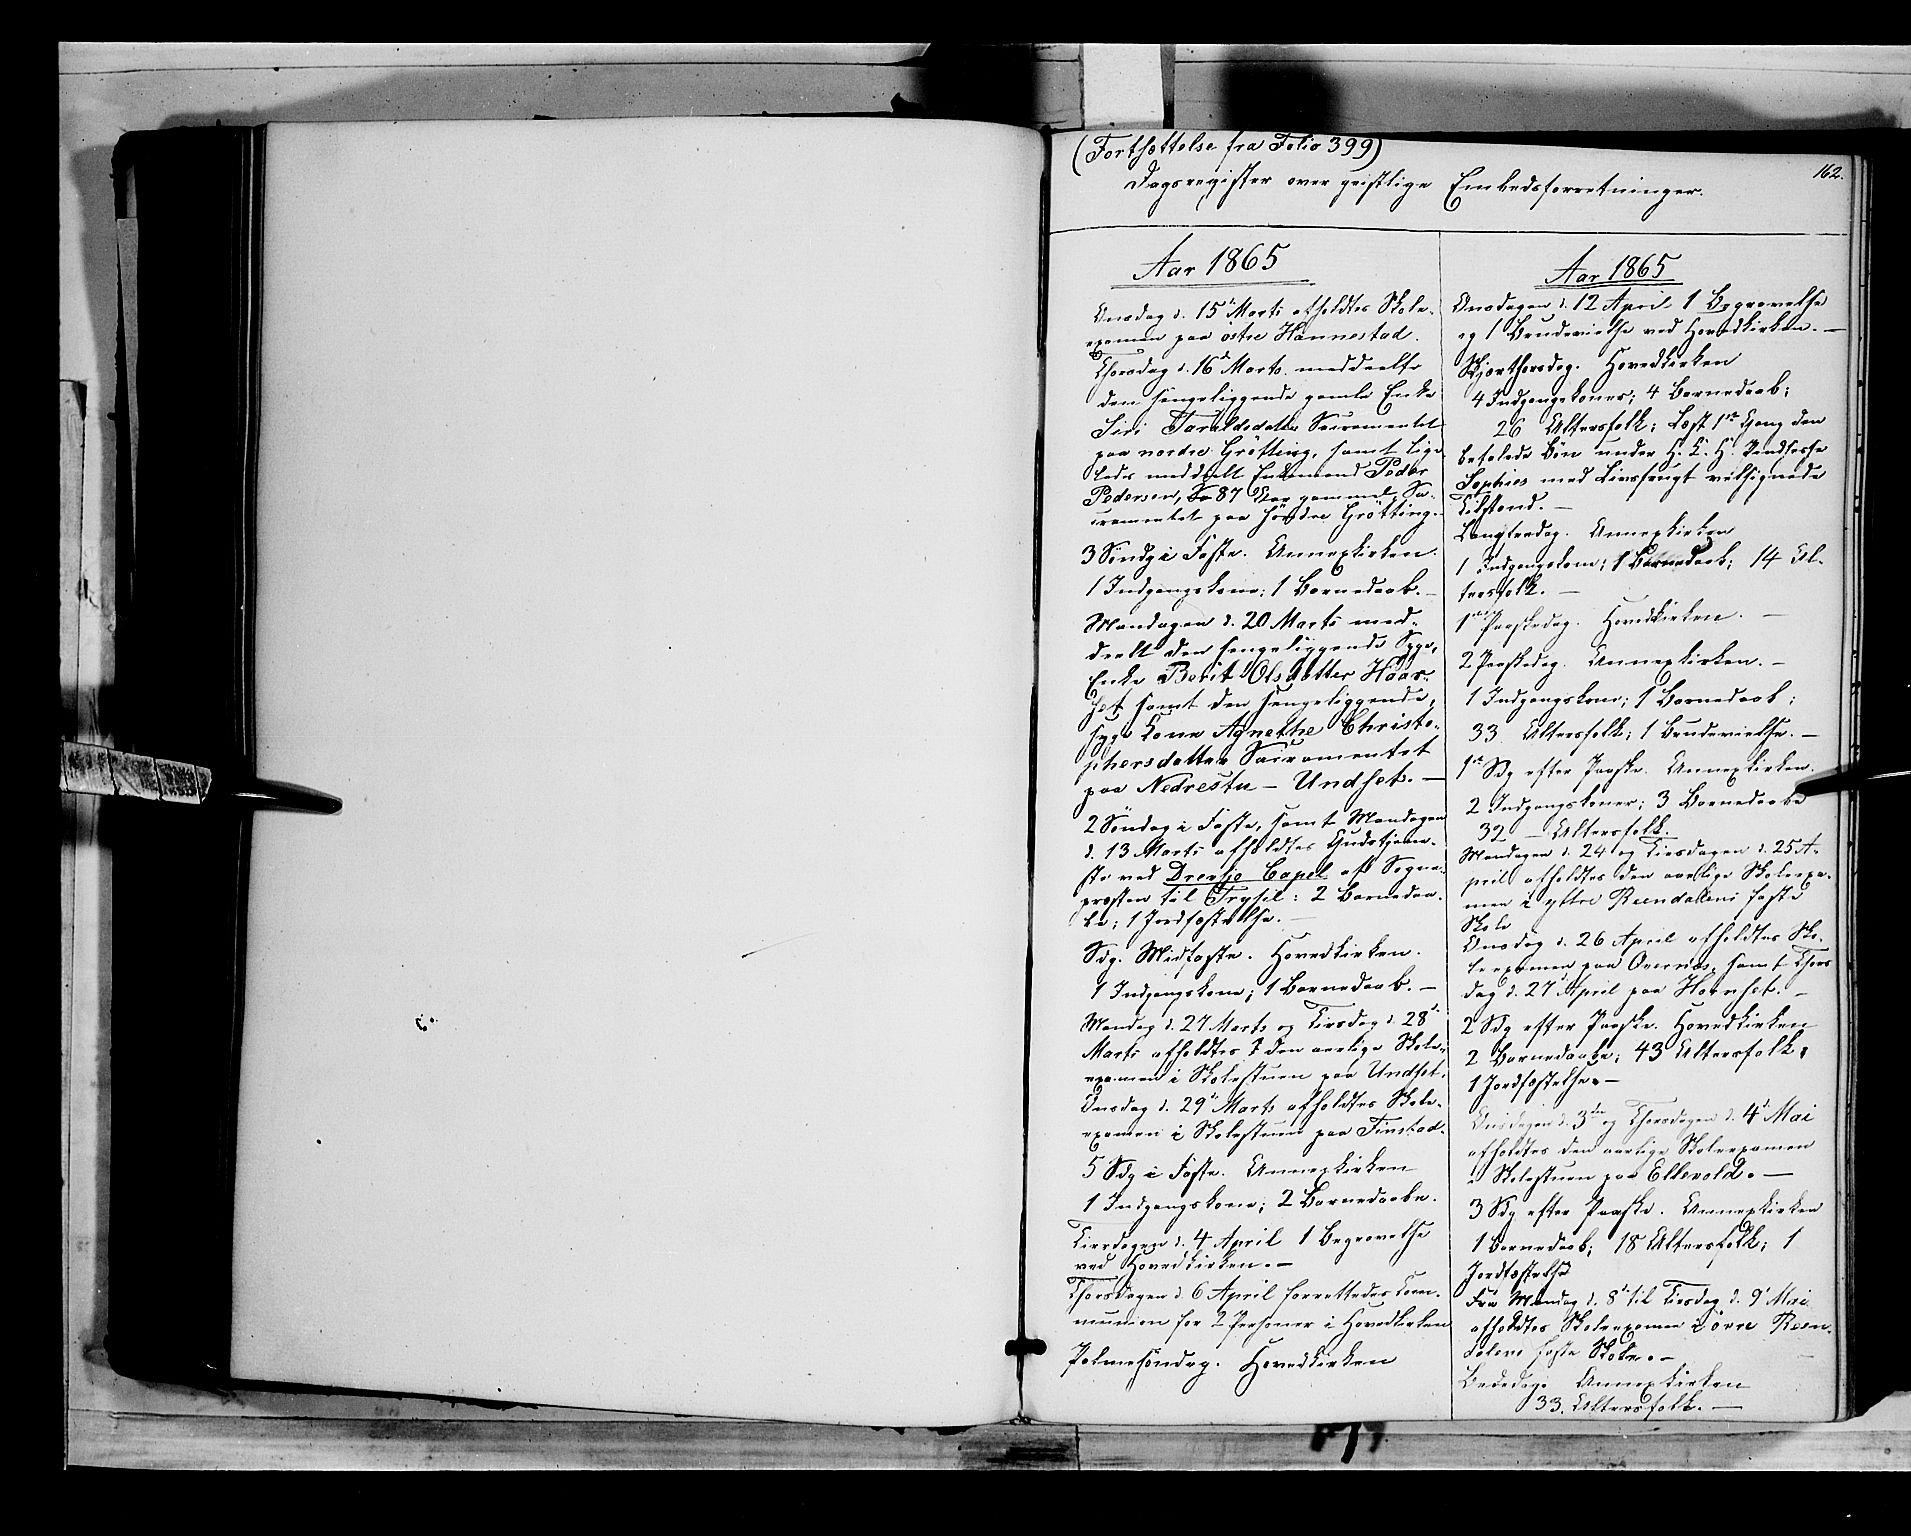 SAH, Rendalen prestekontor, H/Ha/Haa/L0005: Ministerialbok nr. 5, 1853-1866, s. 162